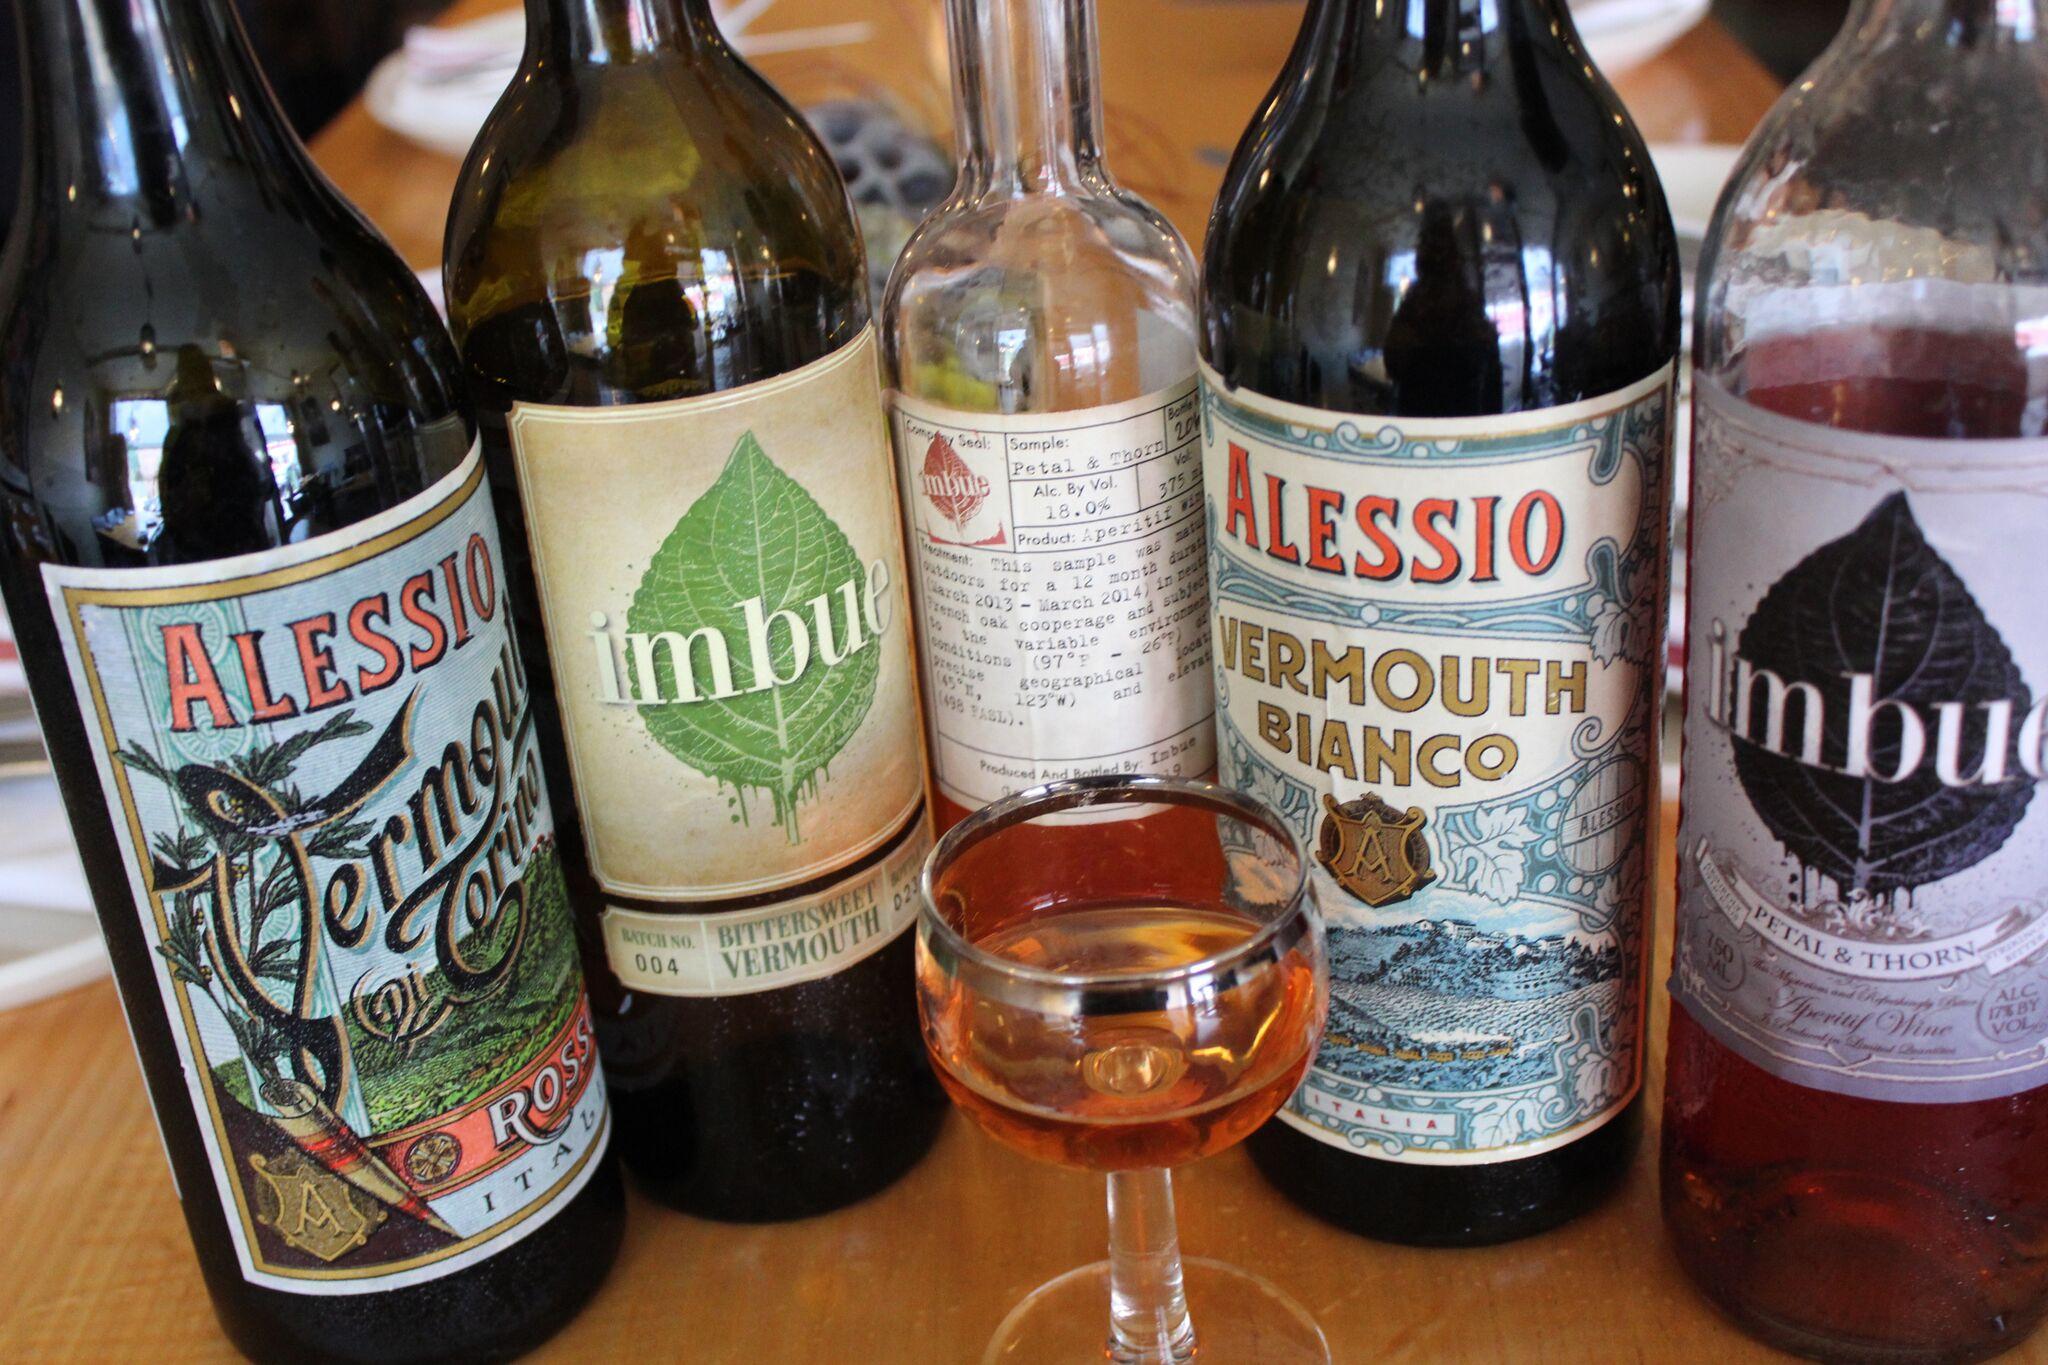 vermouth-line-up-at-autre-monde